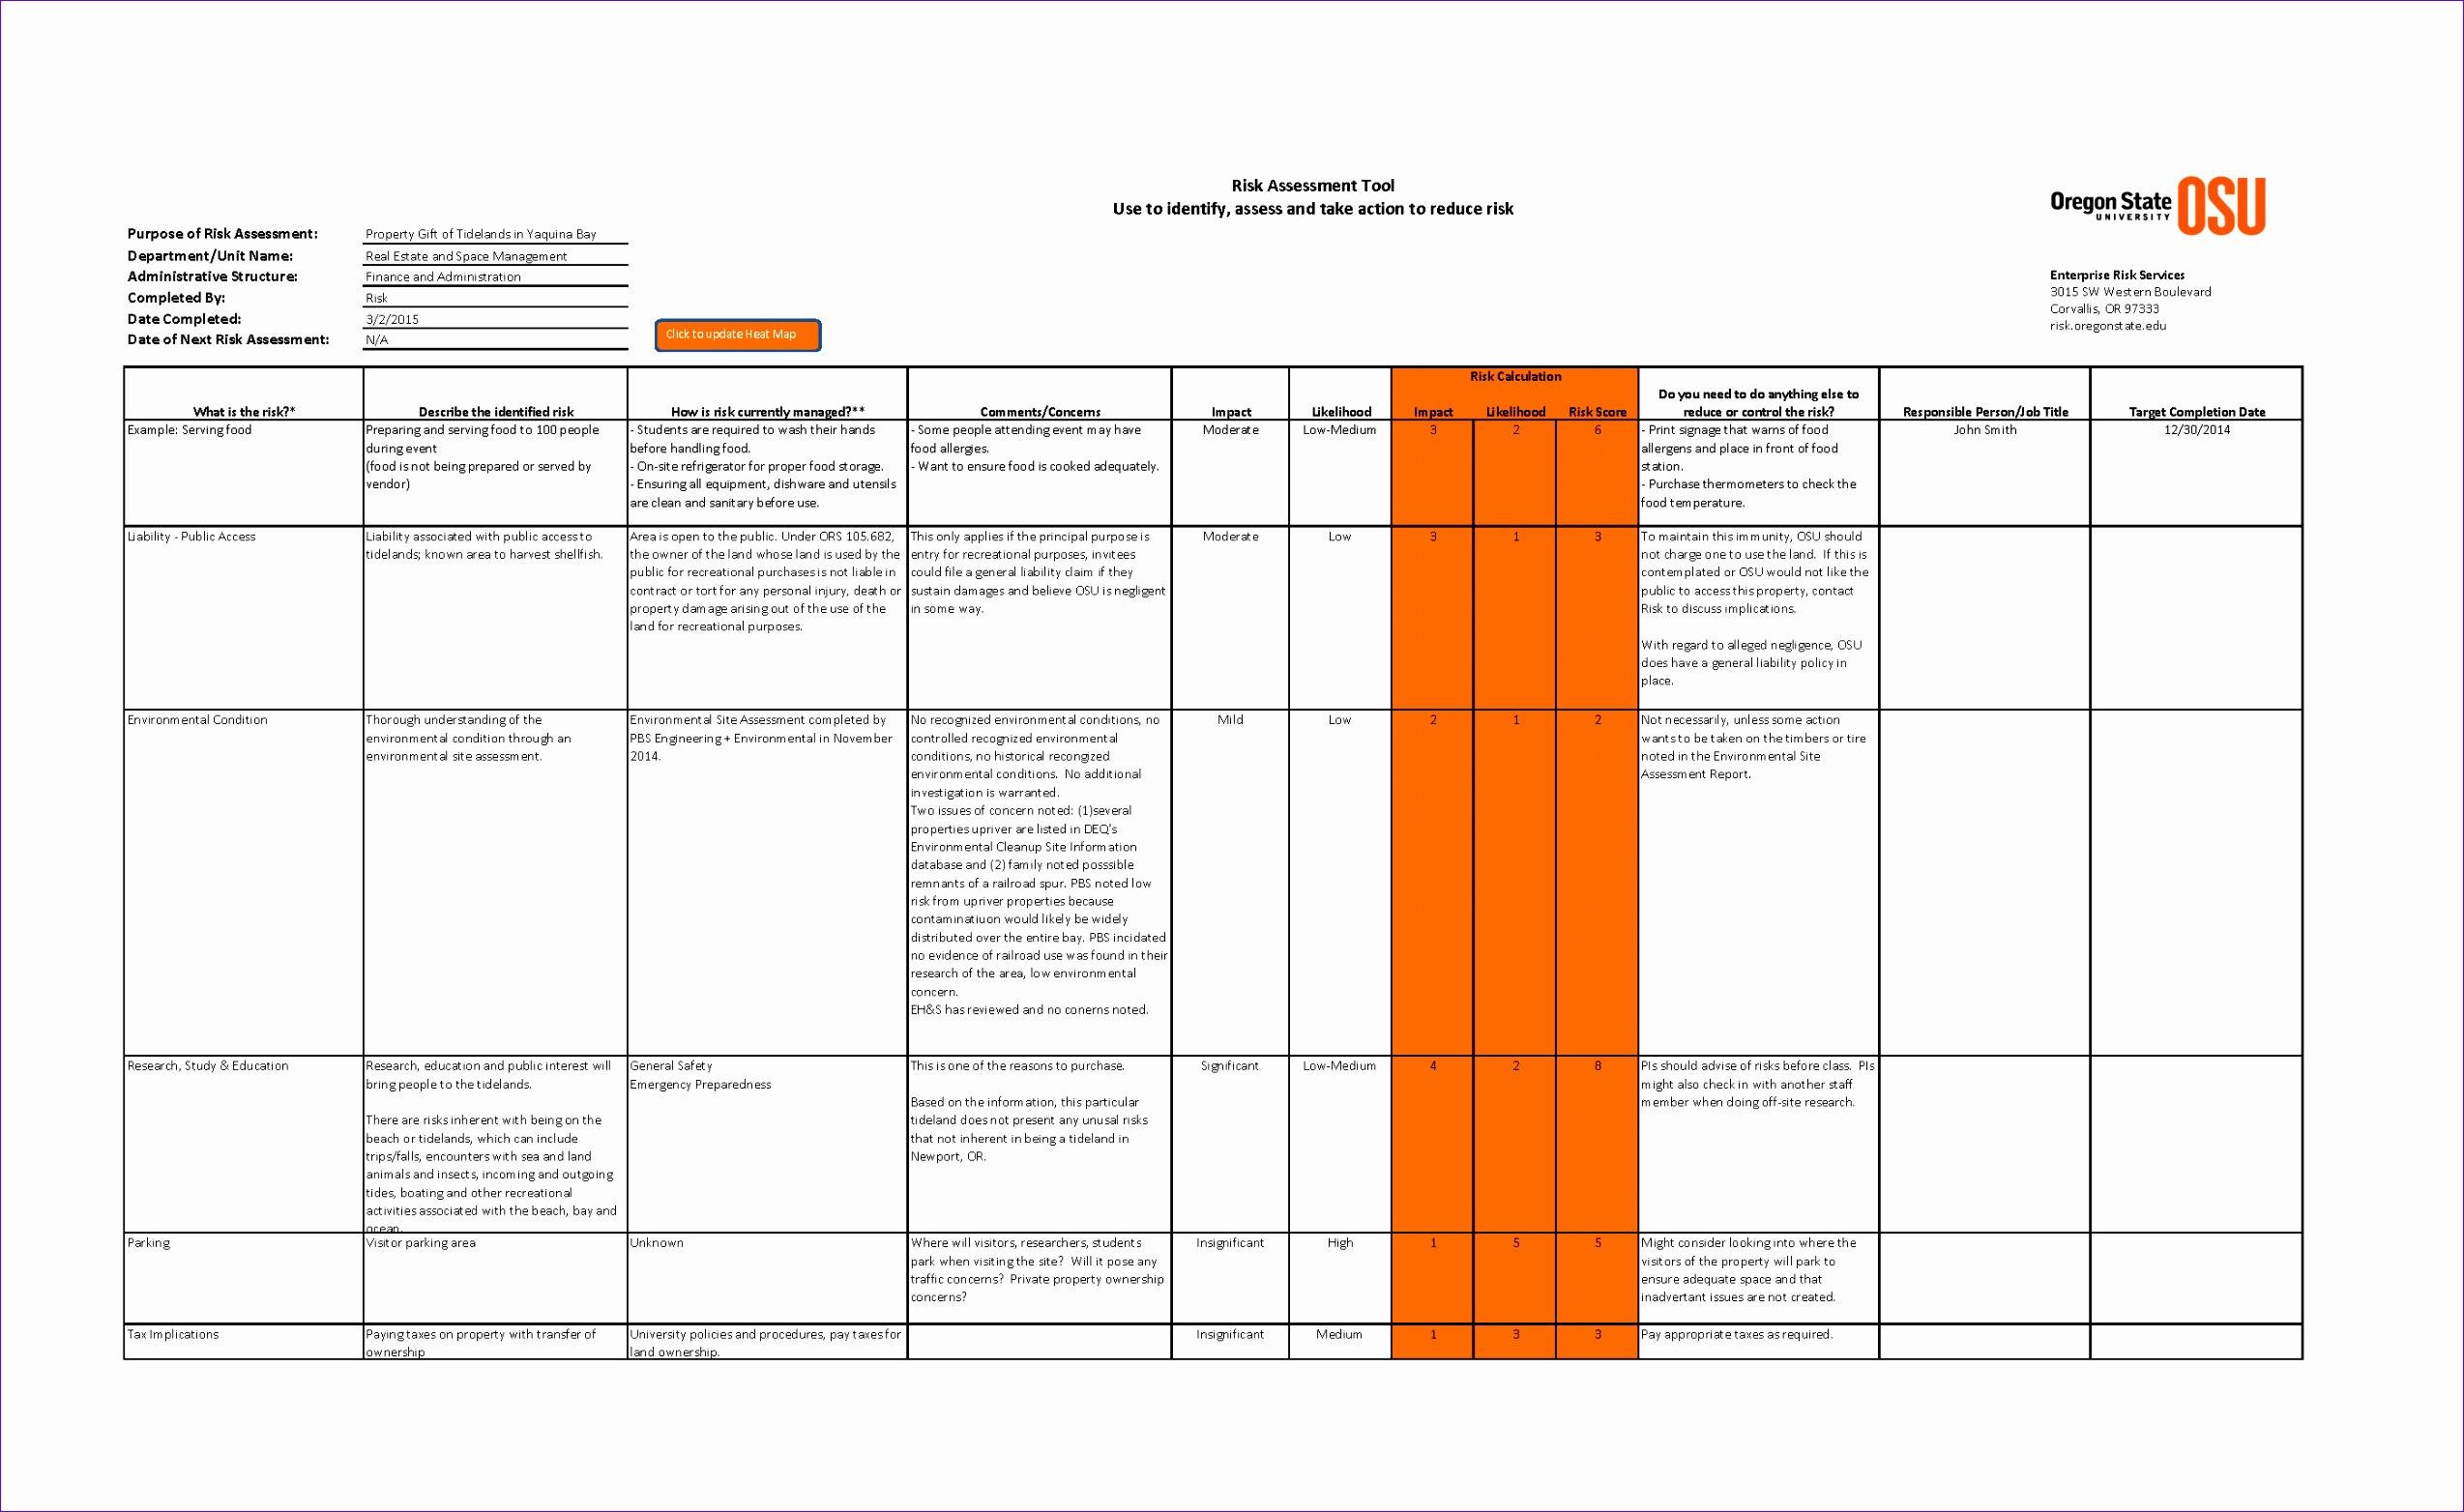 RiskAssessmentTool Page 1